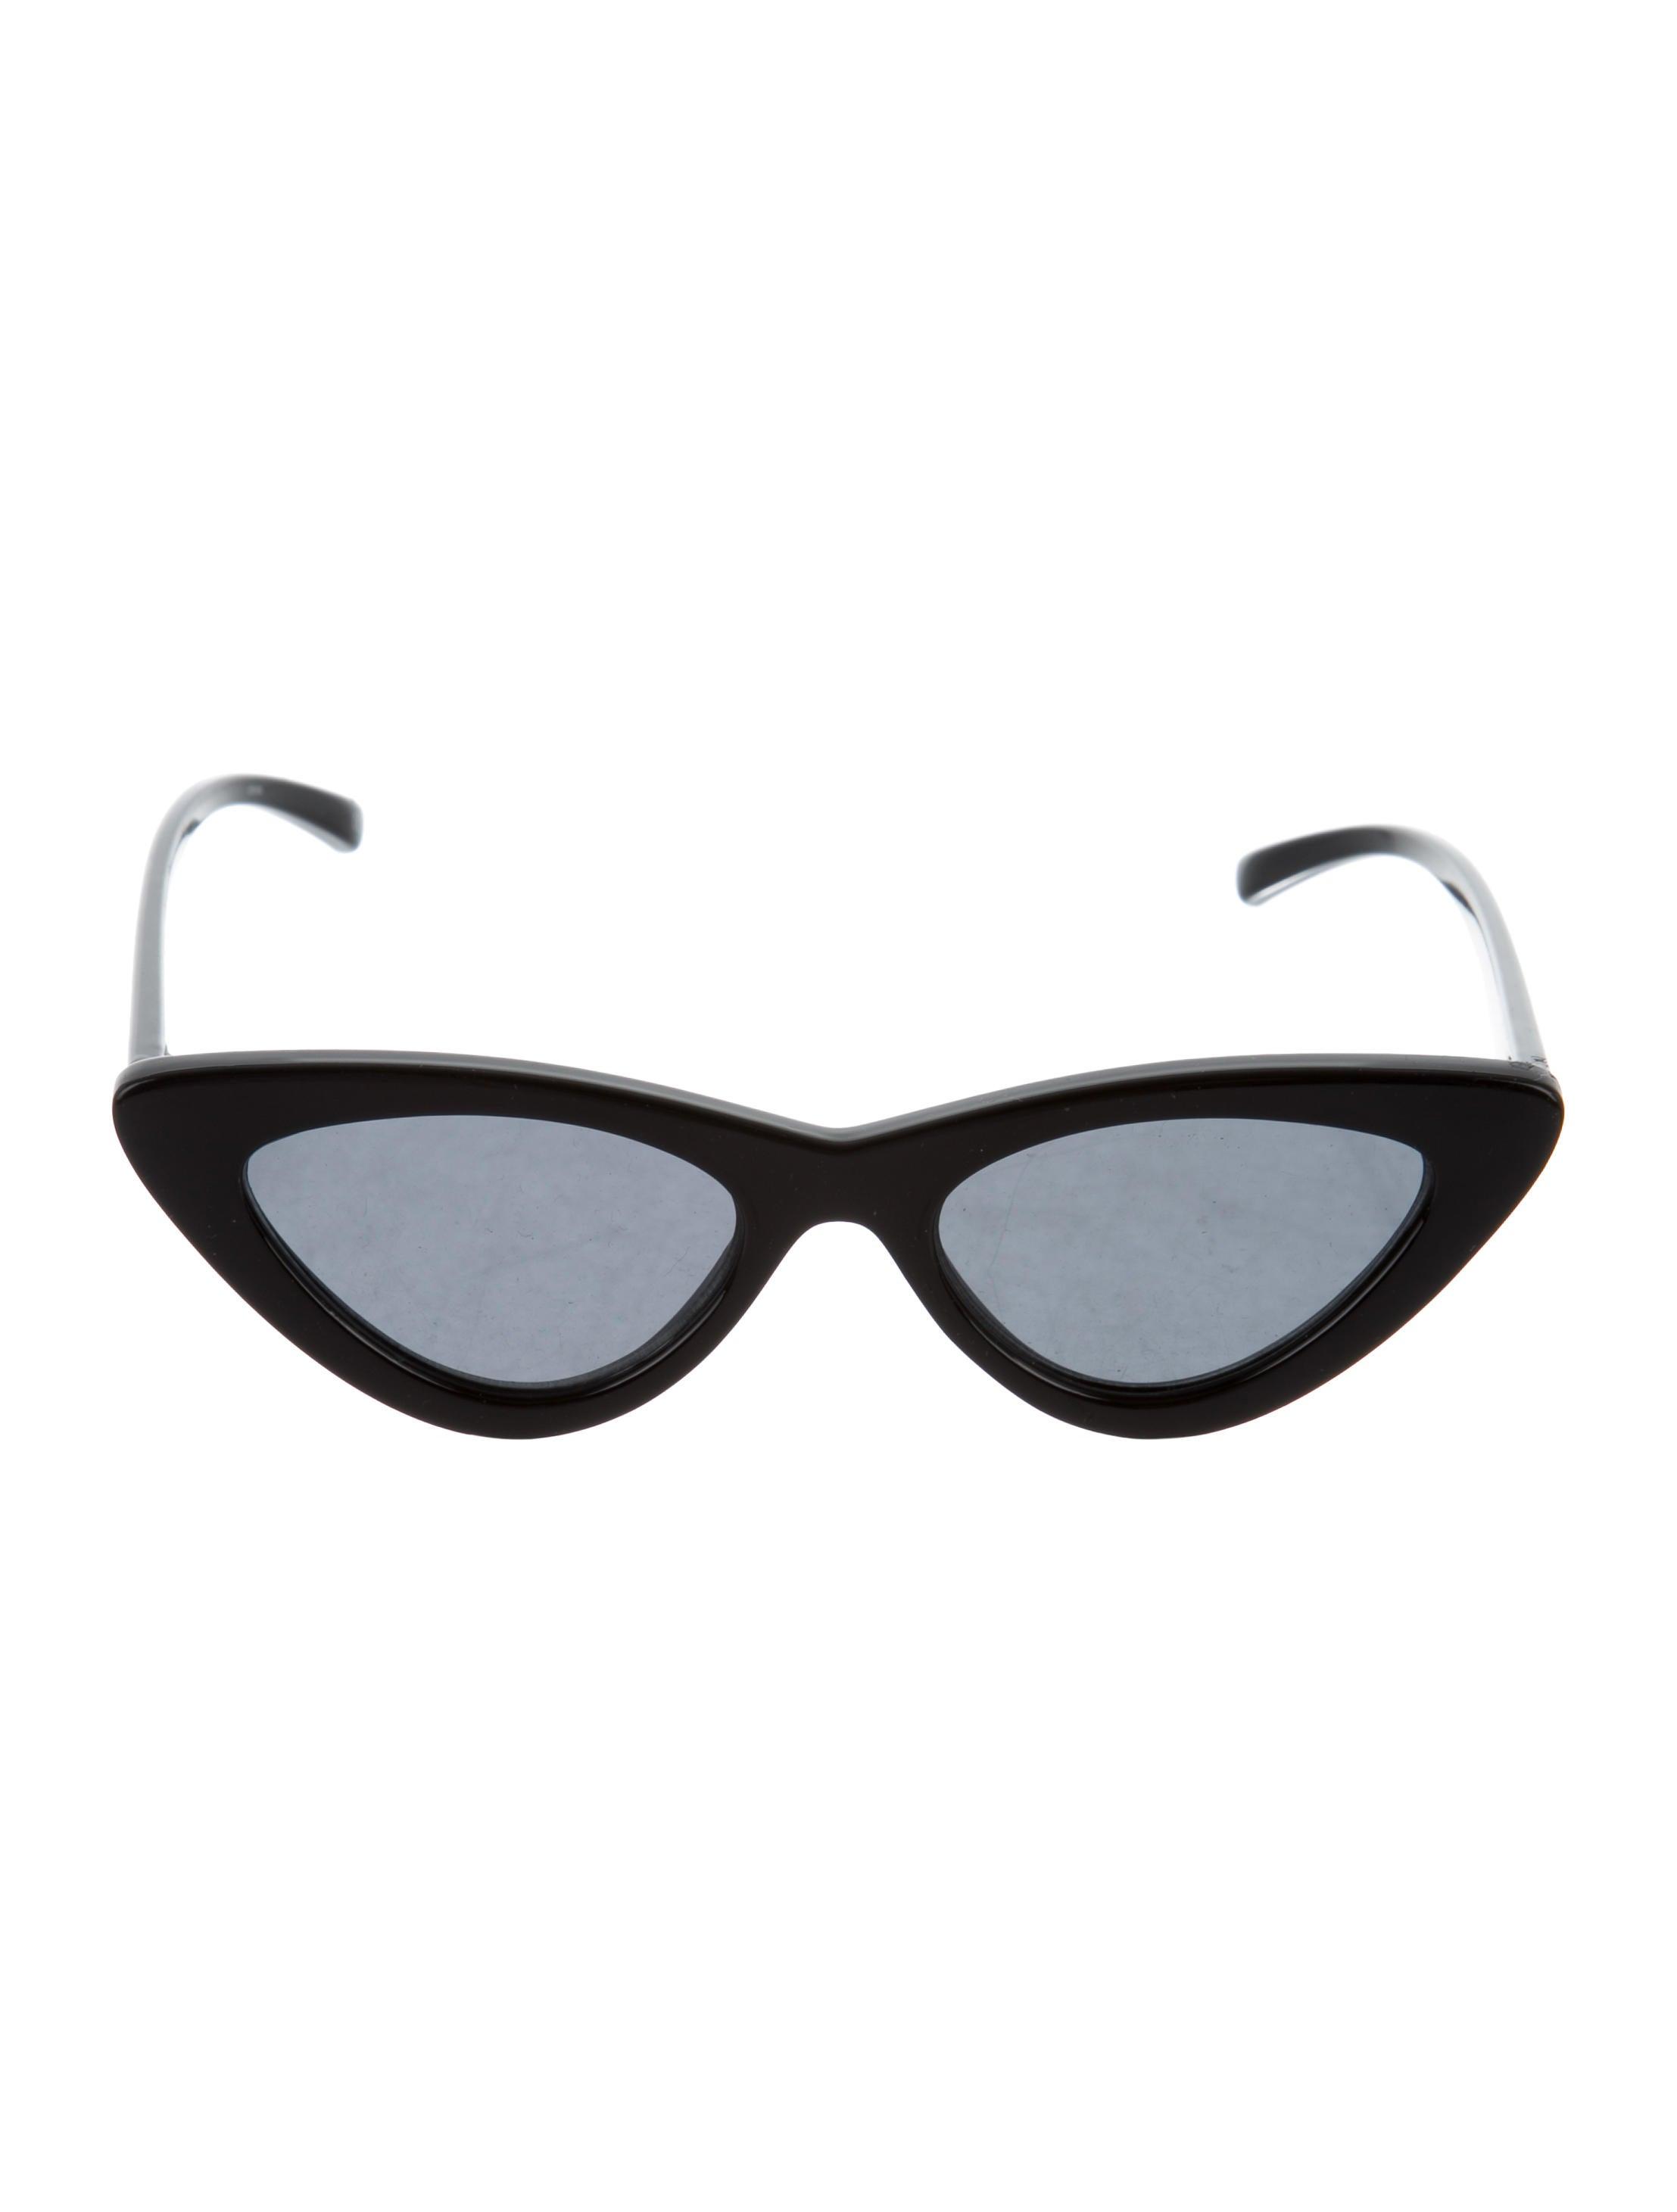 023500a15157 Adam Selman x Le Specs The Last Lolita Cat-Eye Sunglasses ...